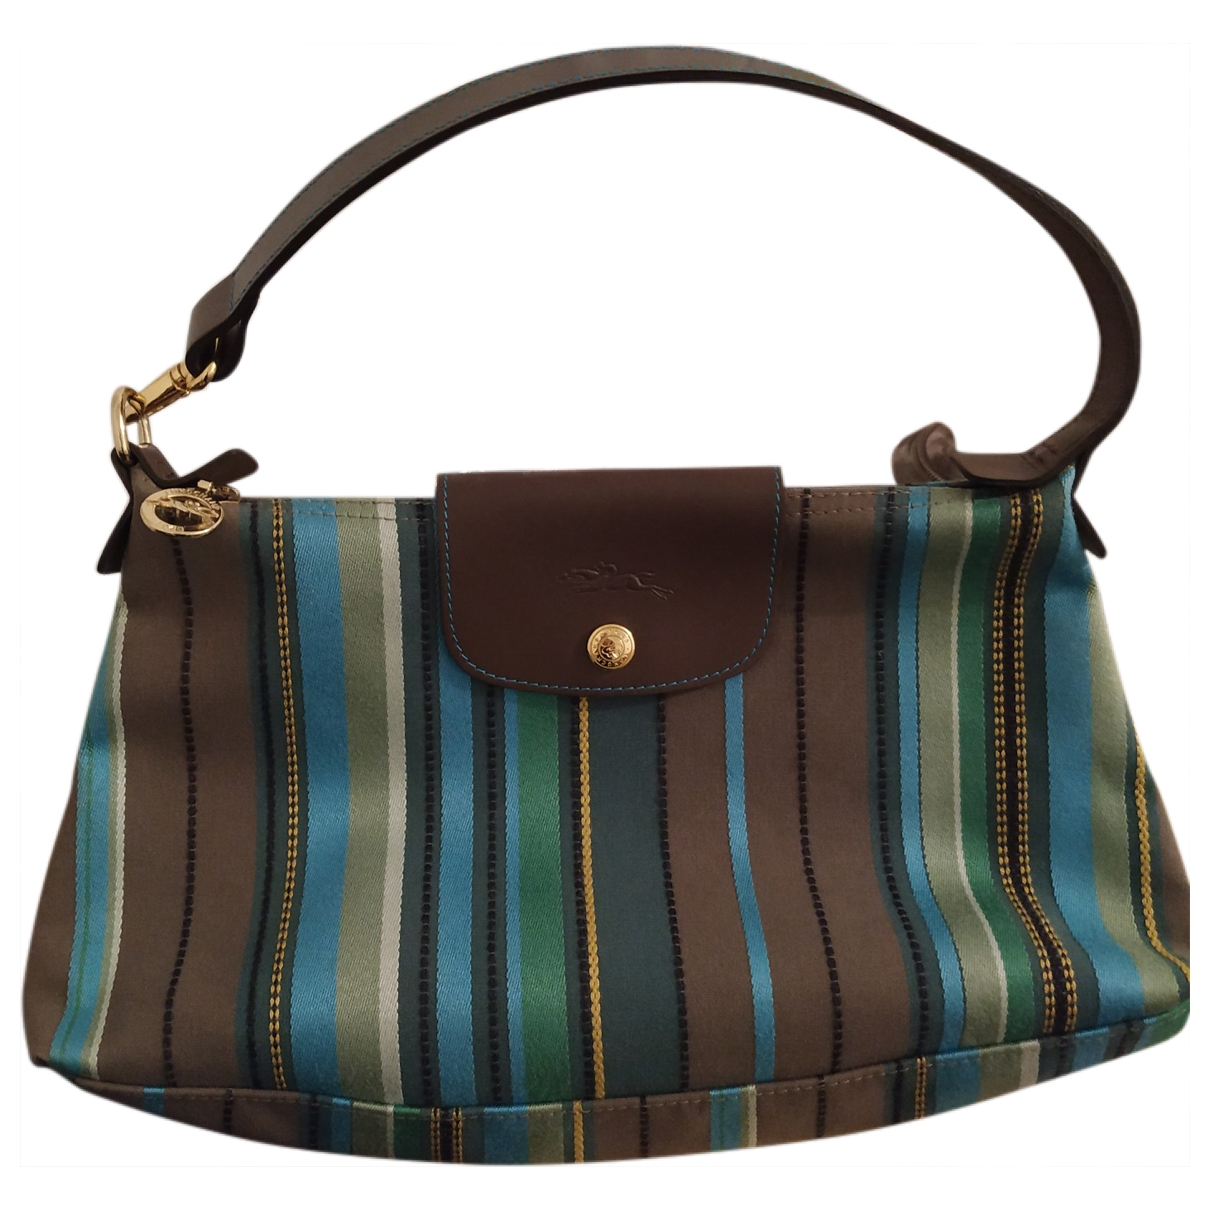 Longchamp \N Handtasche in  Khaki Leinen